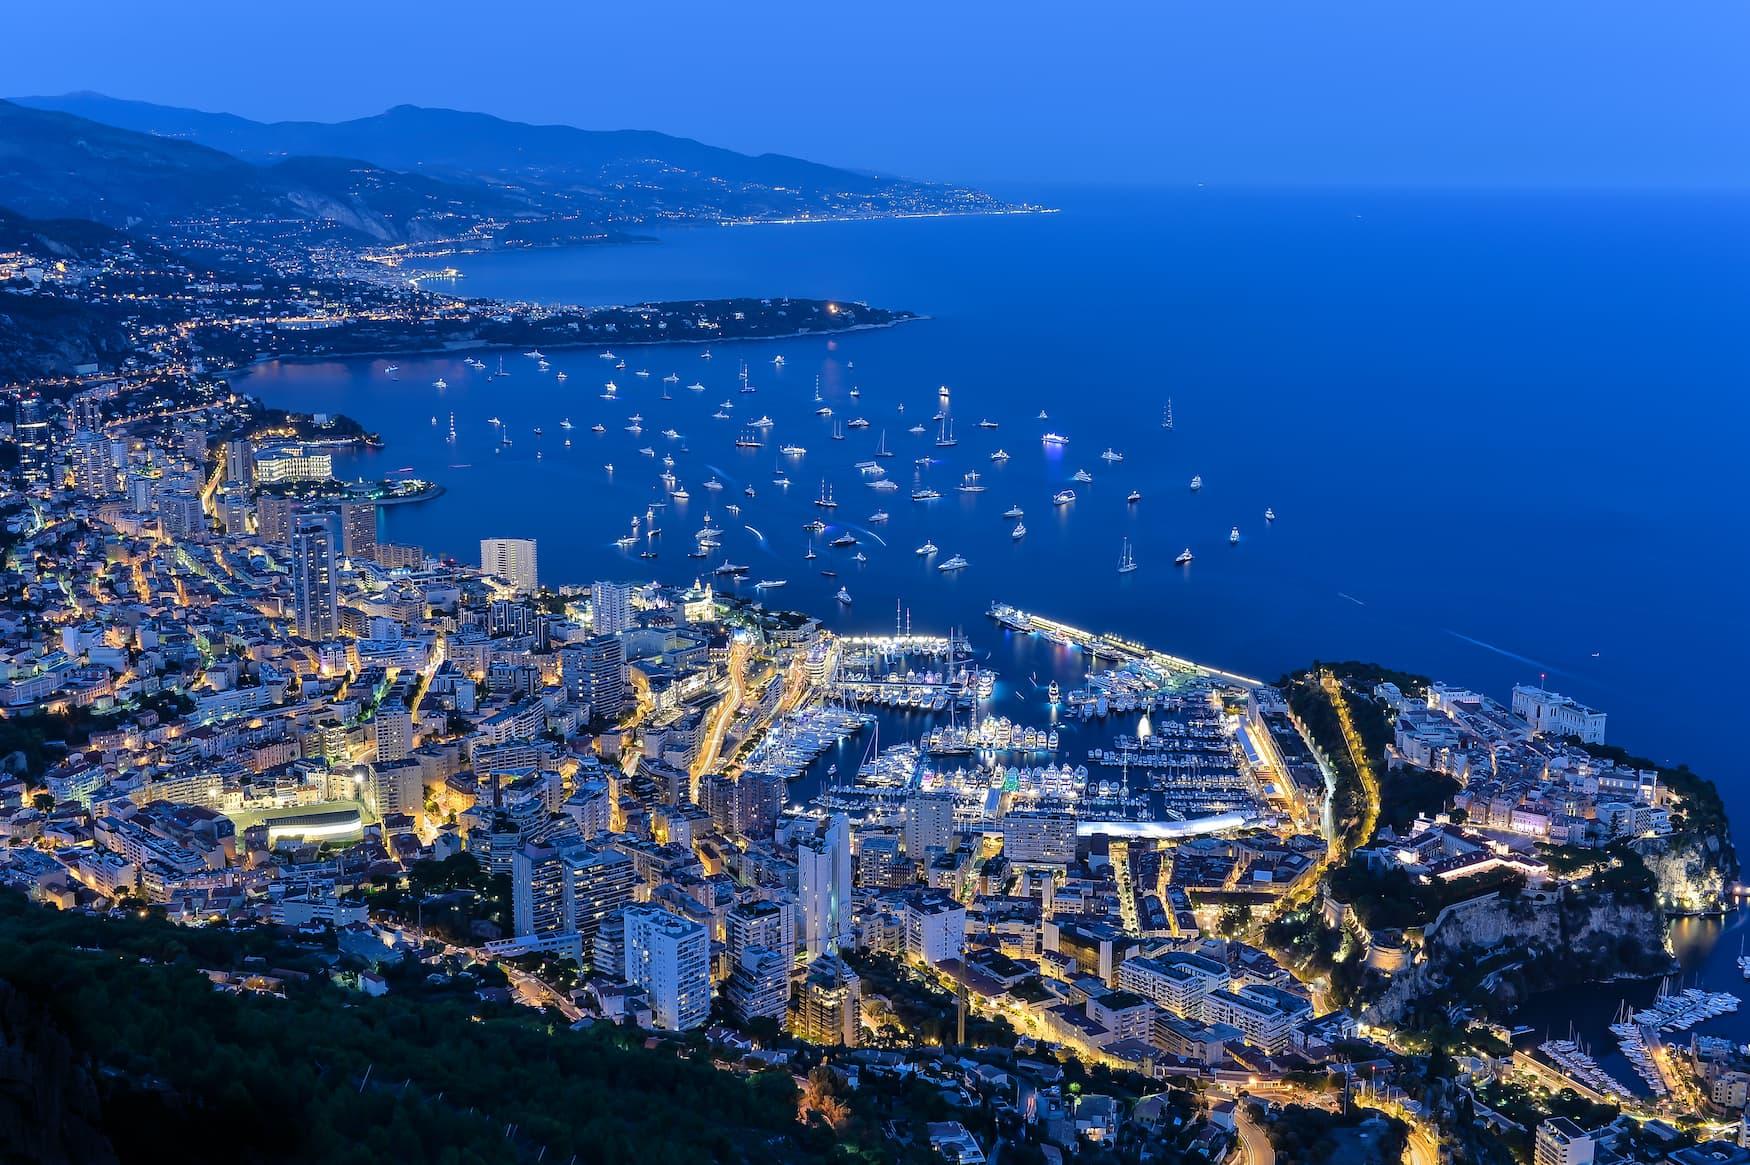 Blick über Monaco am Abend, Yachten im Meer